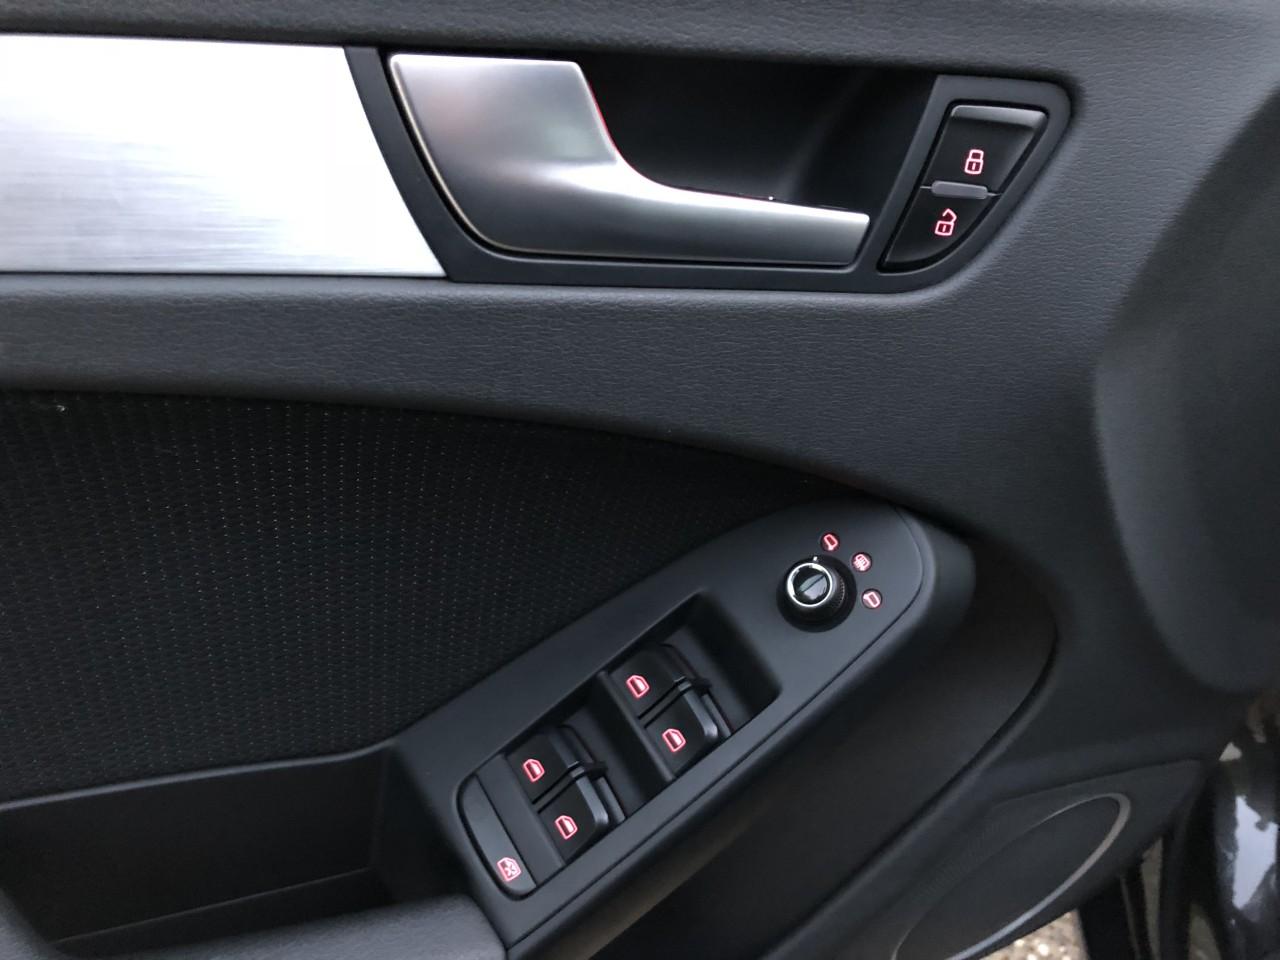 Audi A4 2.0 TDI 2010